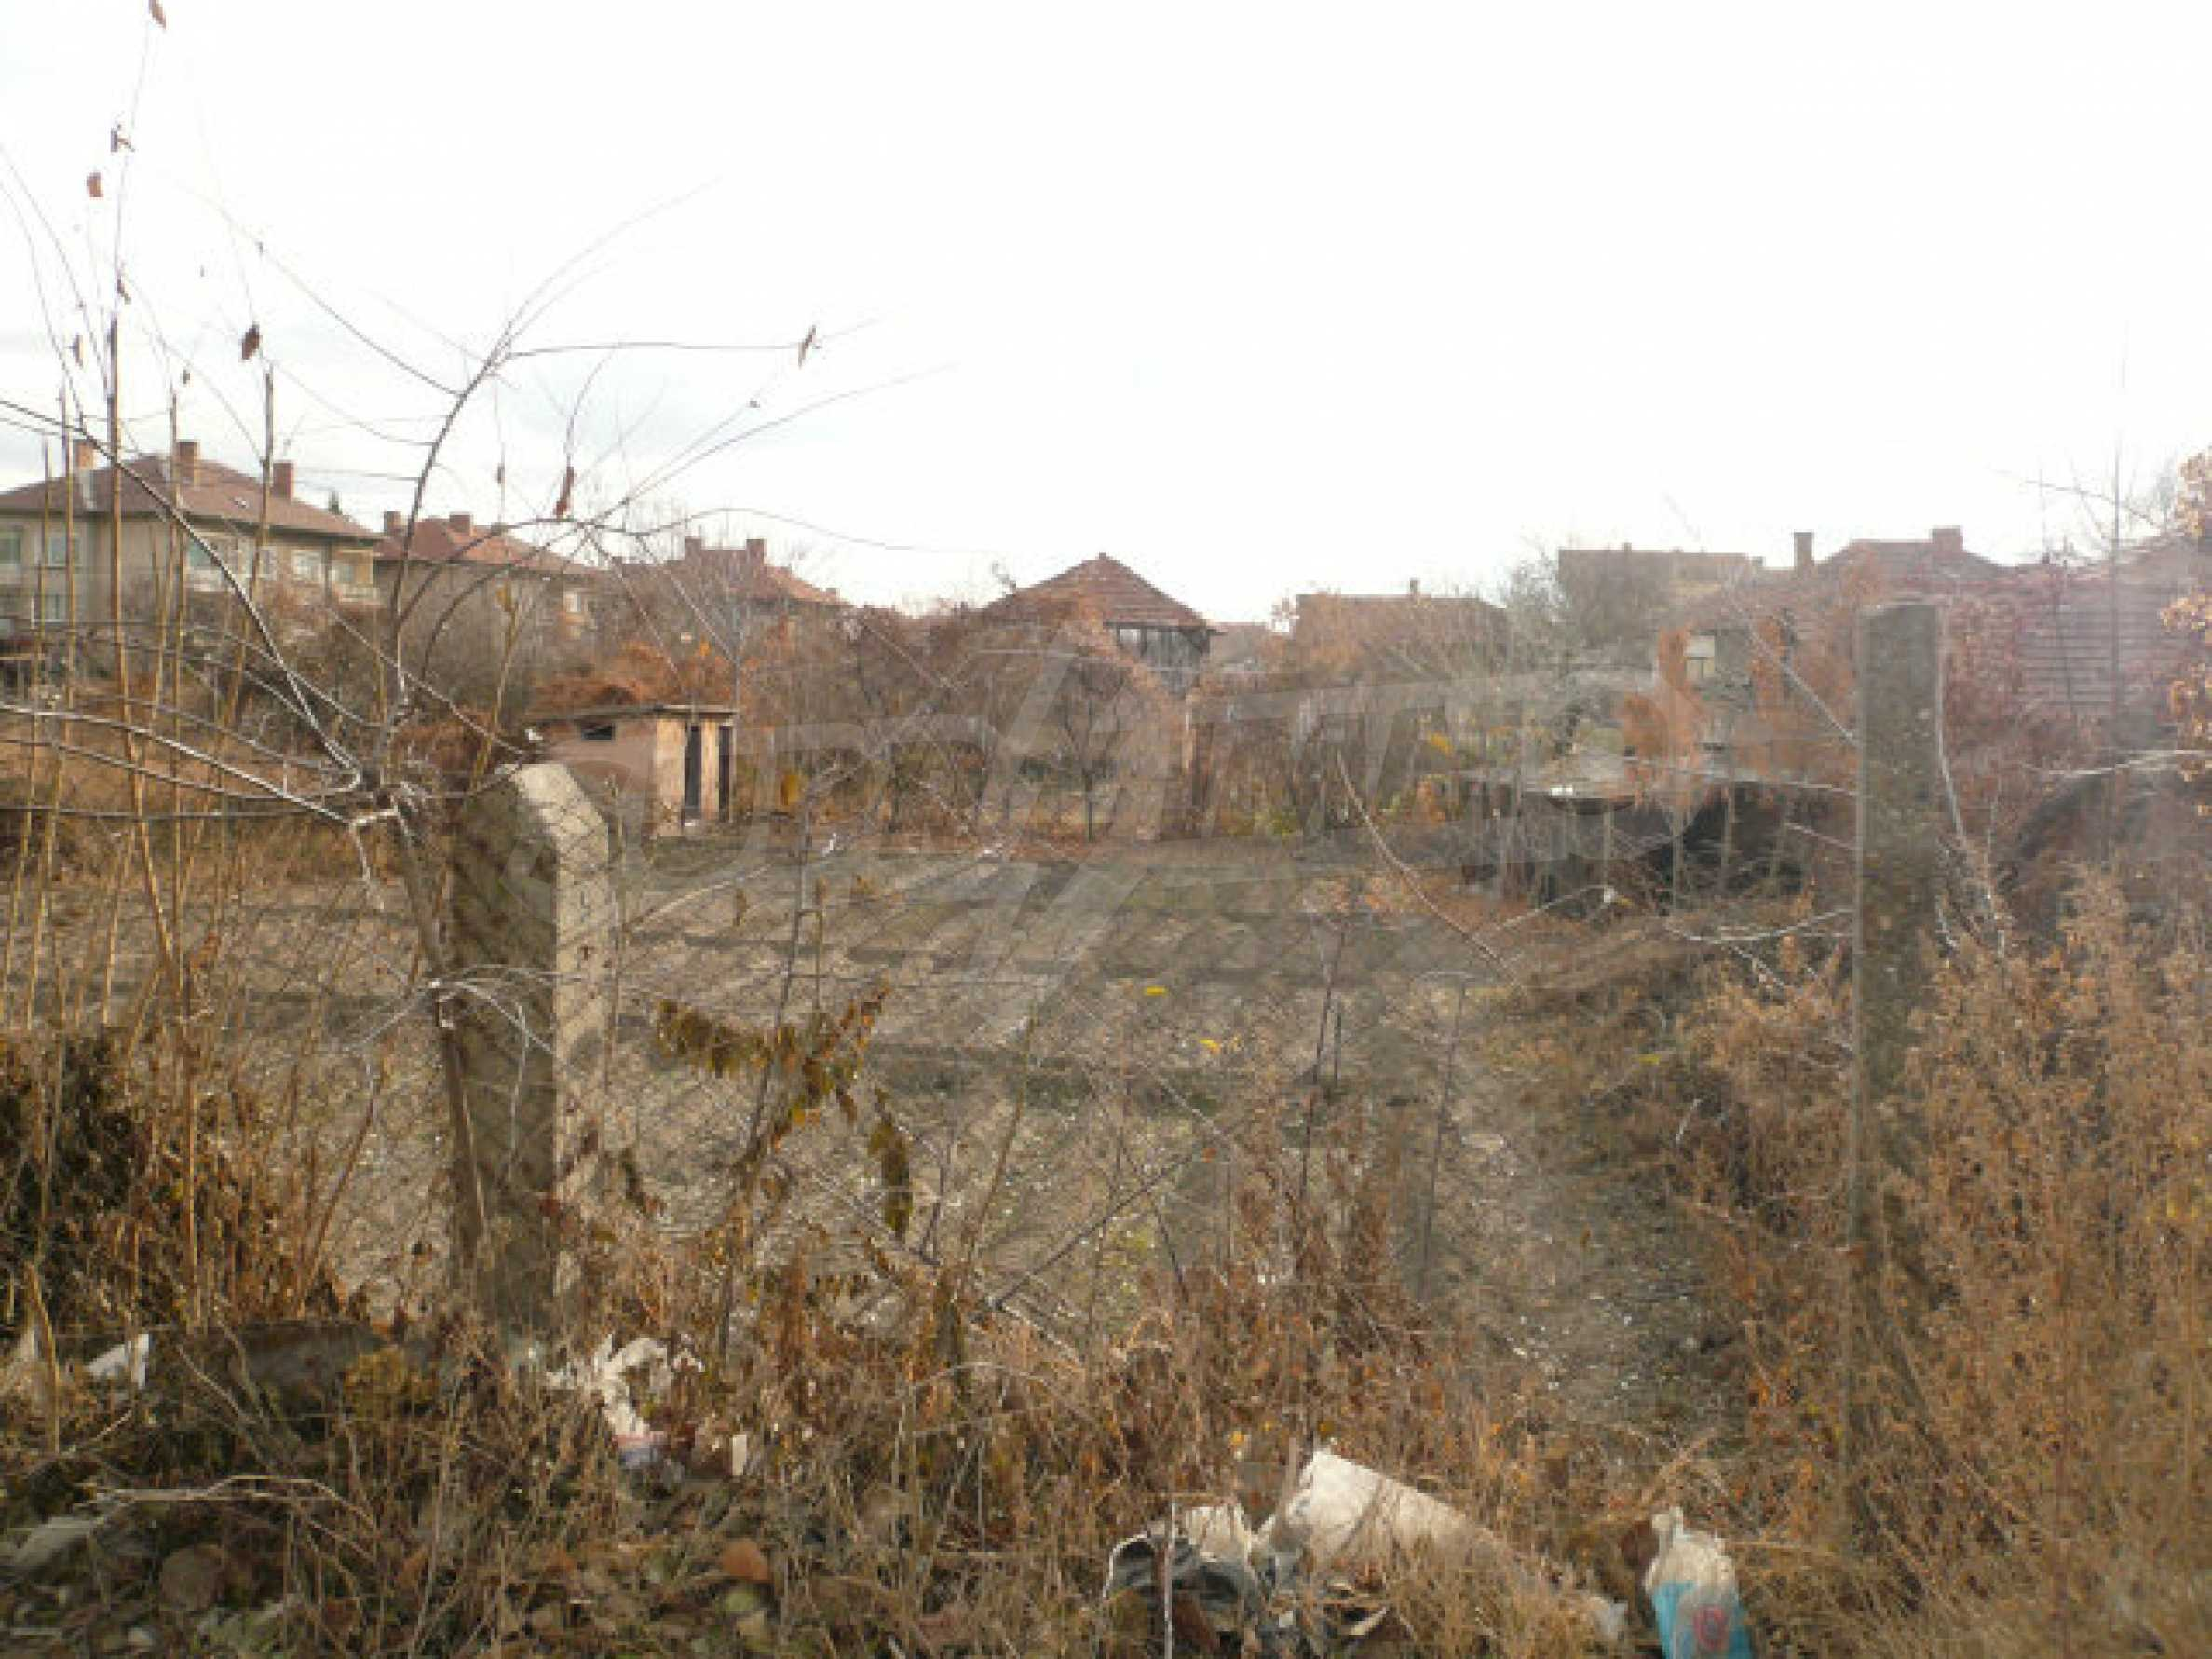 Участок под застройку дома в городе Видин